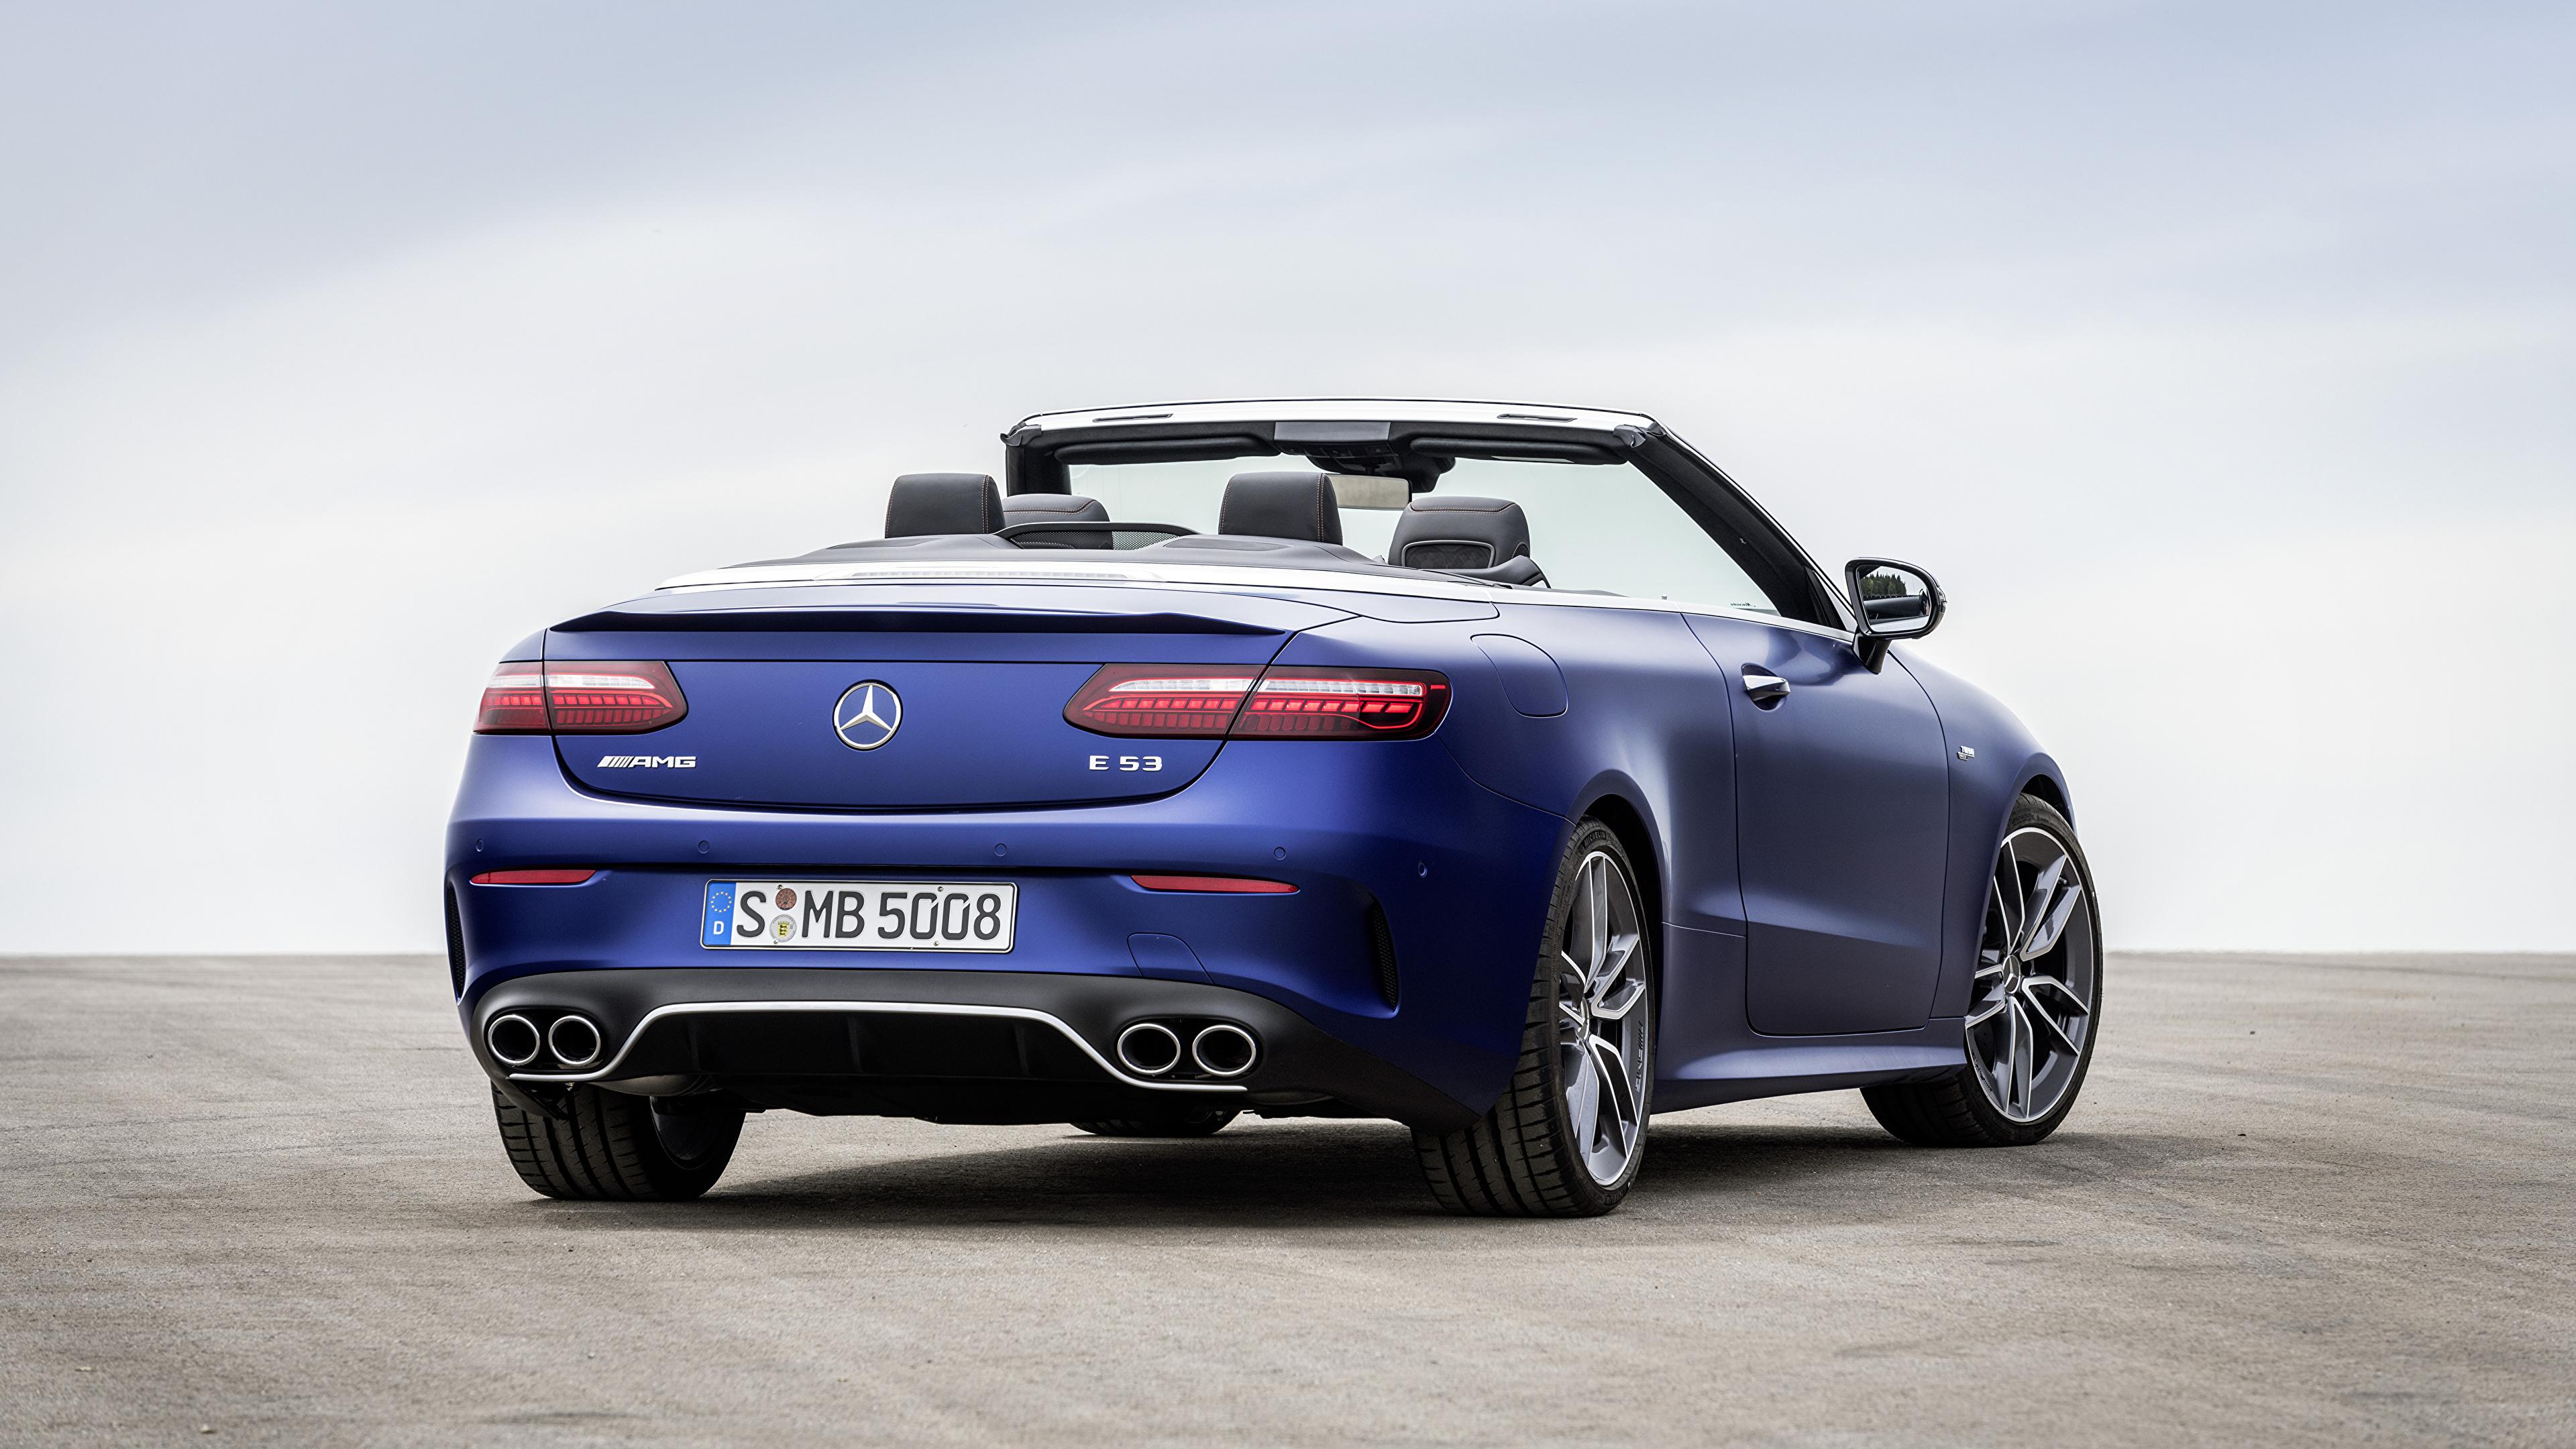 Fotos Mercedes-Benz E 53 4MATIC, Cabrio Worldwide, A238, 2020 Blau Autos Hinten Metallisch 3840x2160 Cabriolet auto automobil